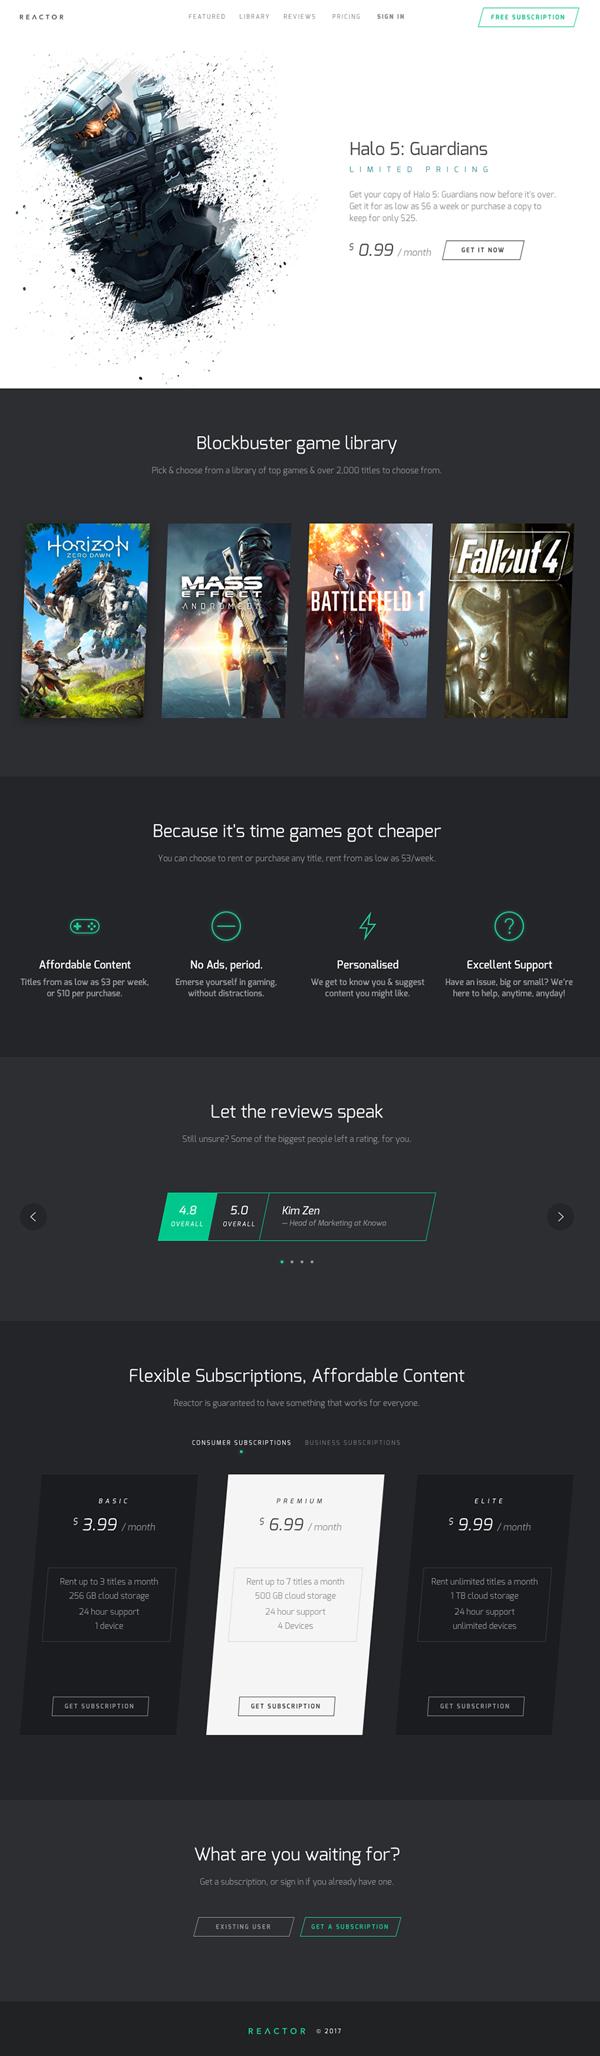 Netflix Style Landing Page PSD Template Free